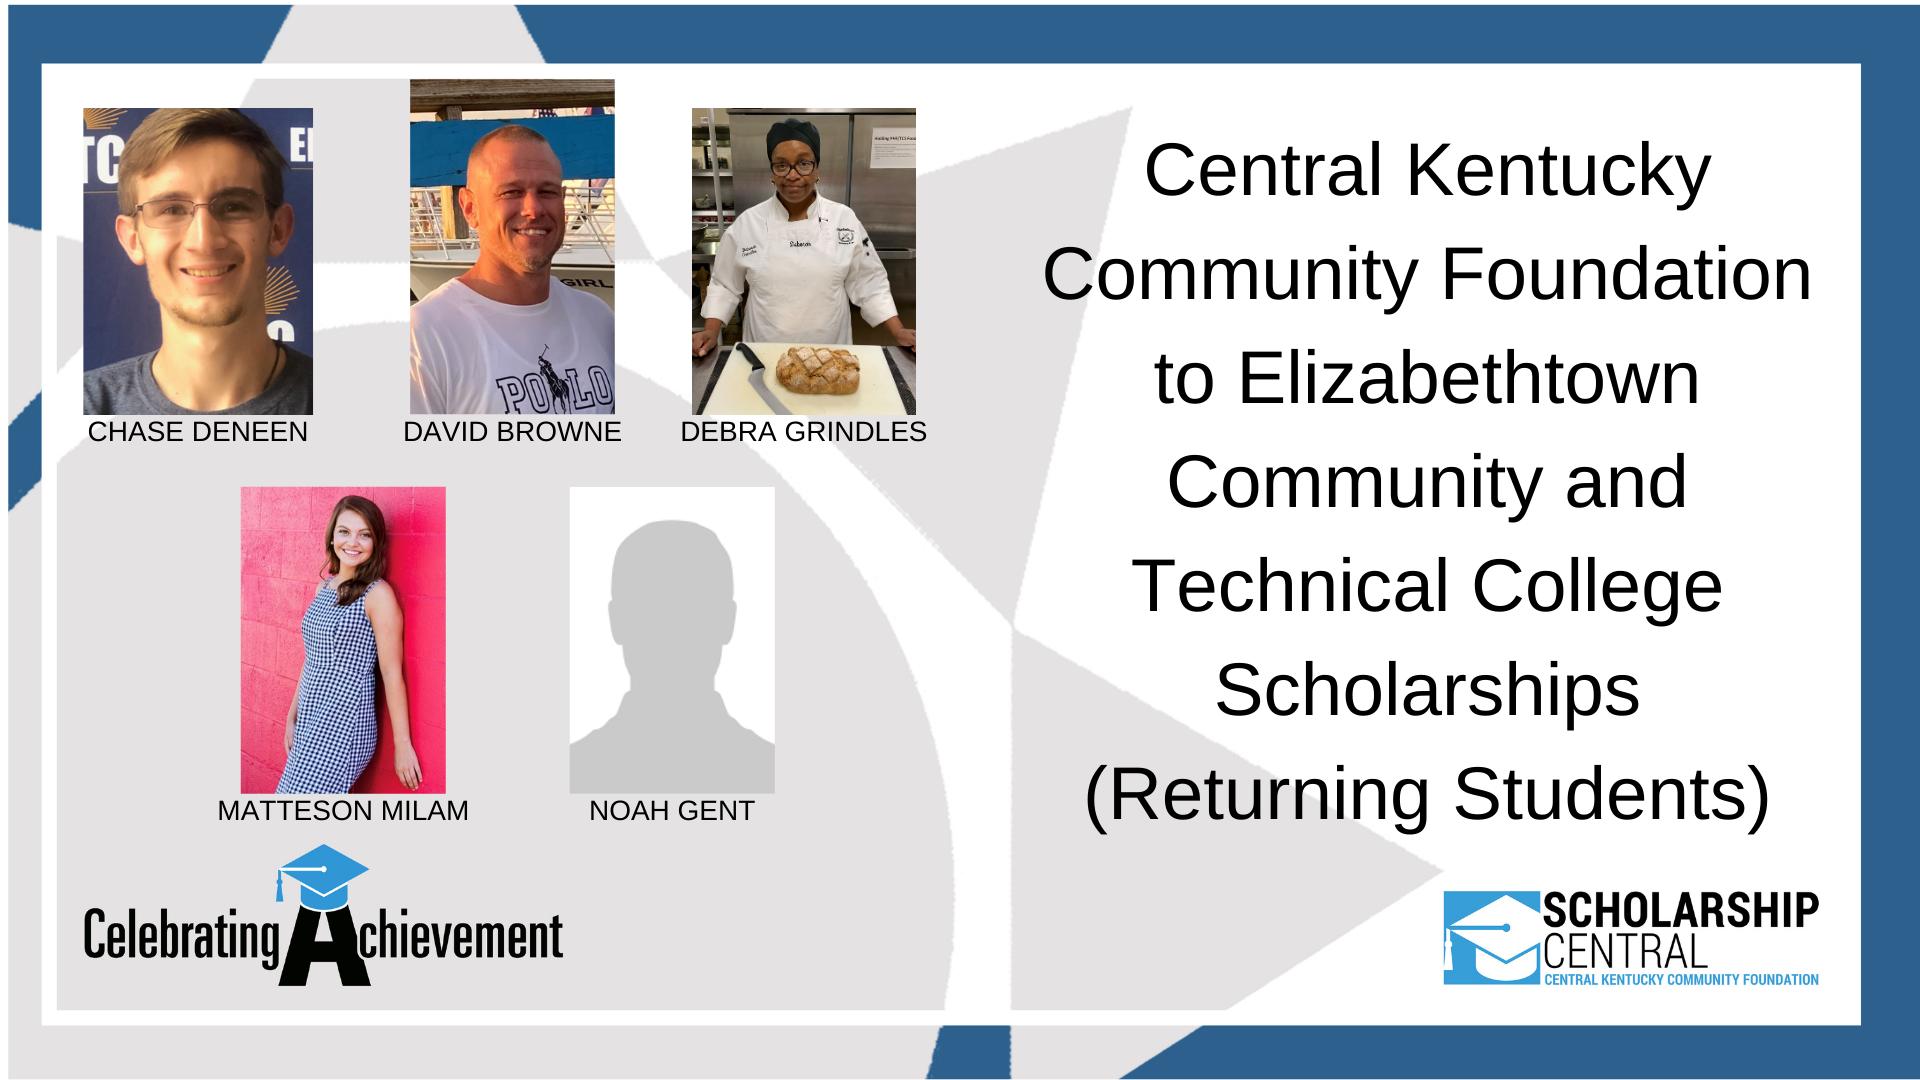 CKCF to ECTC Scholarship RETURNING Winners 3